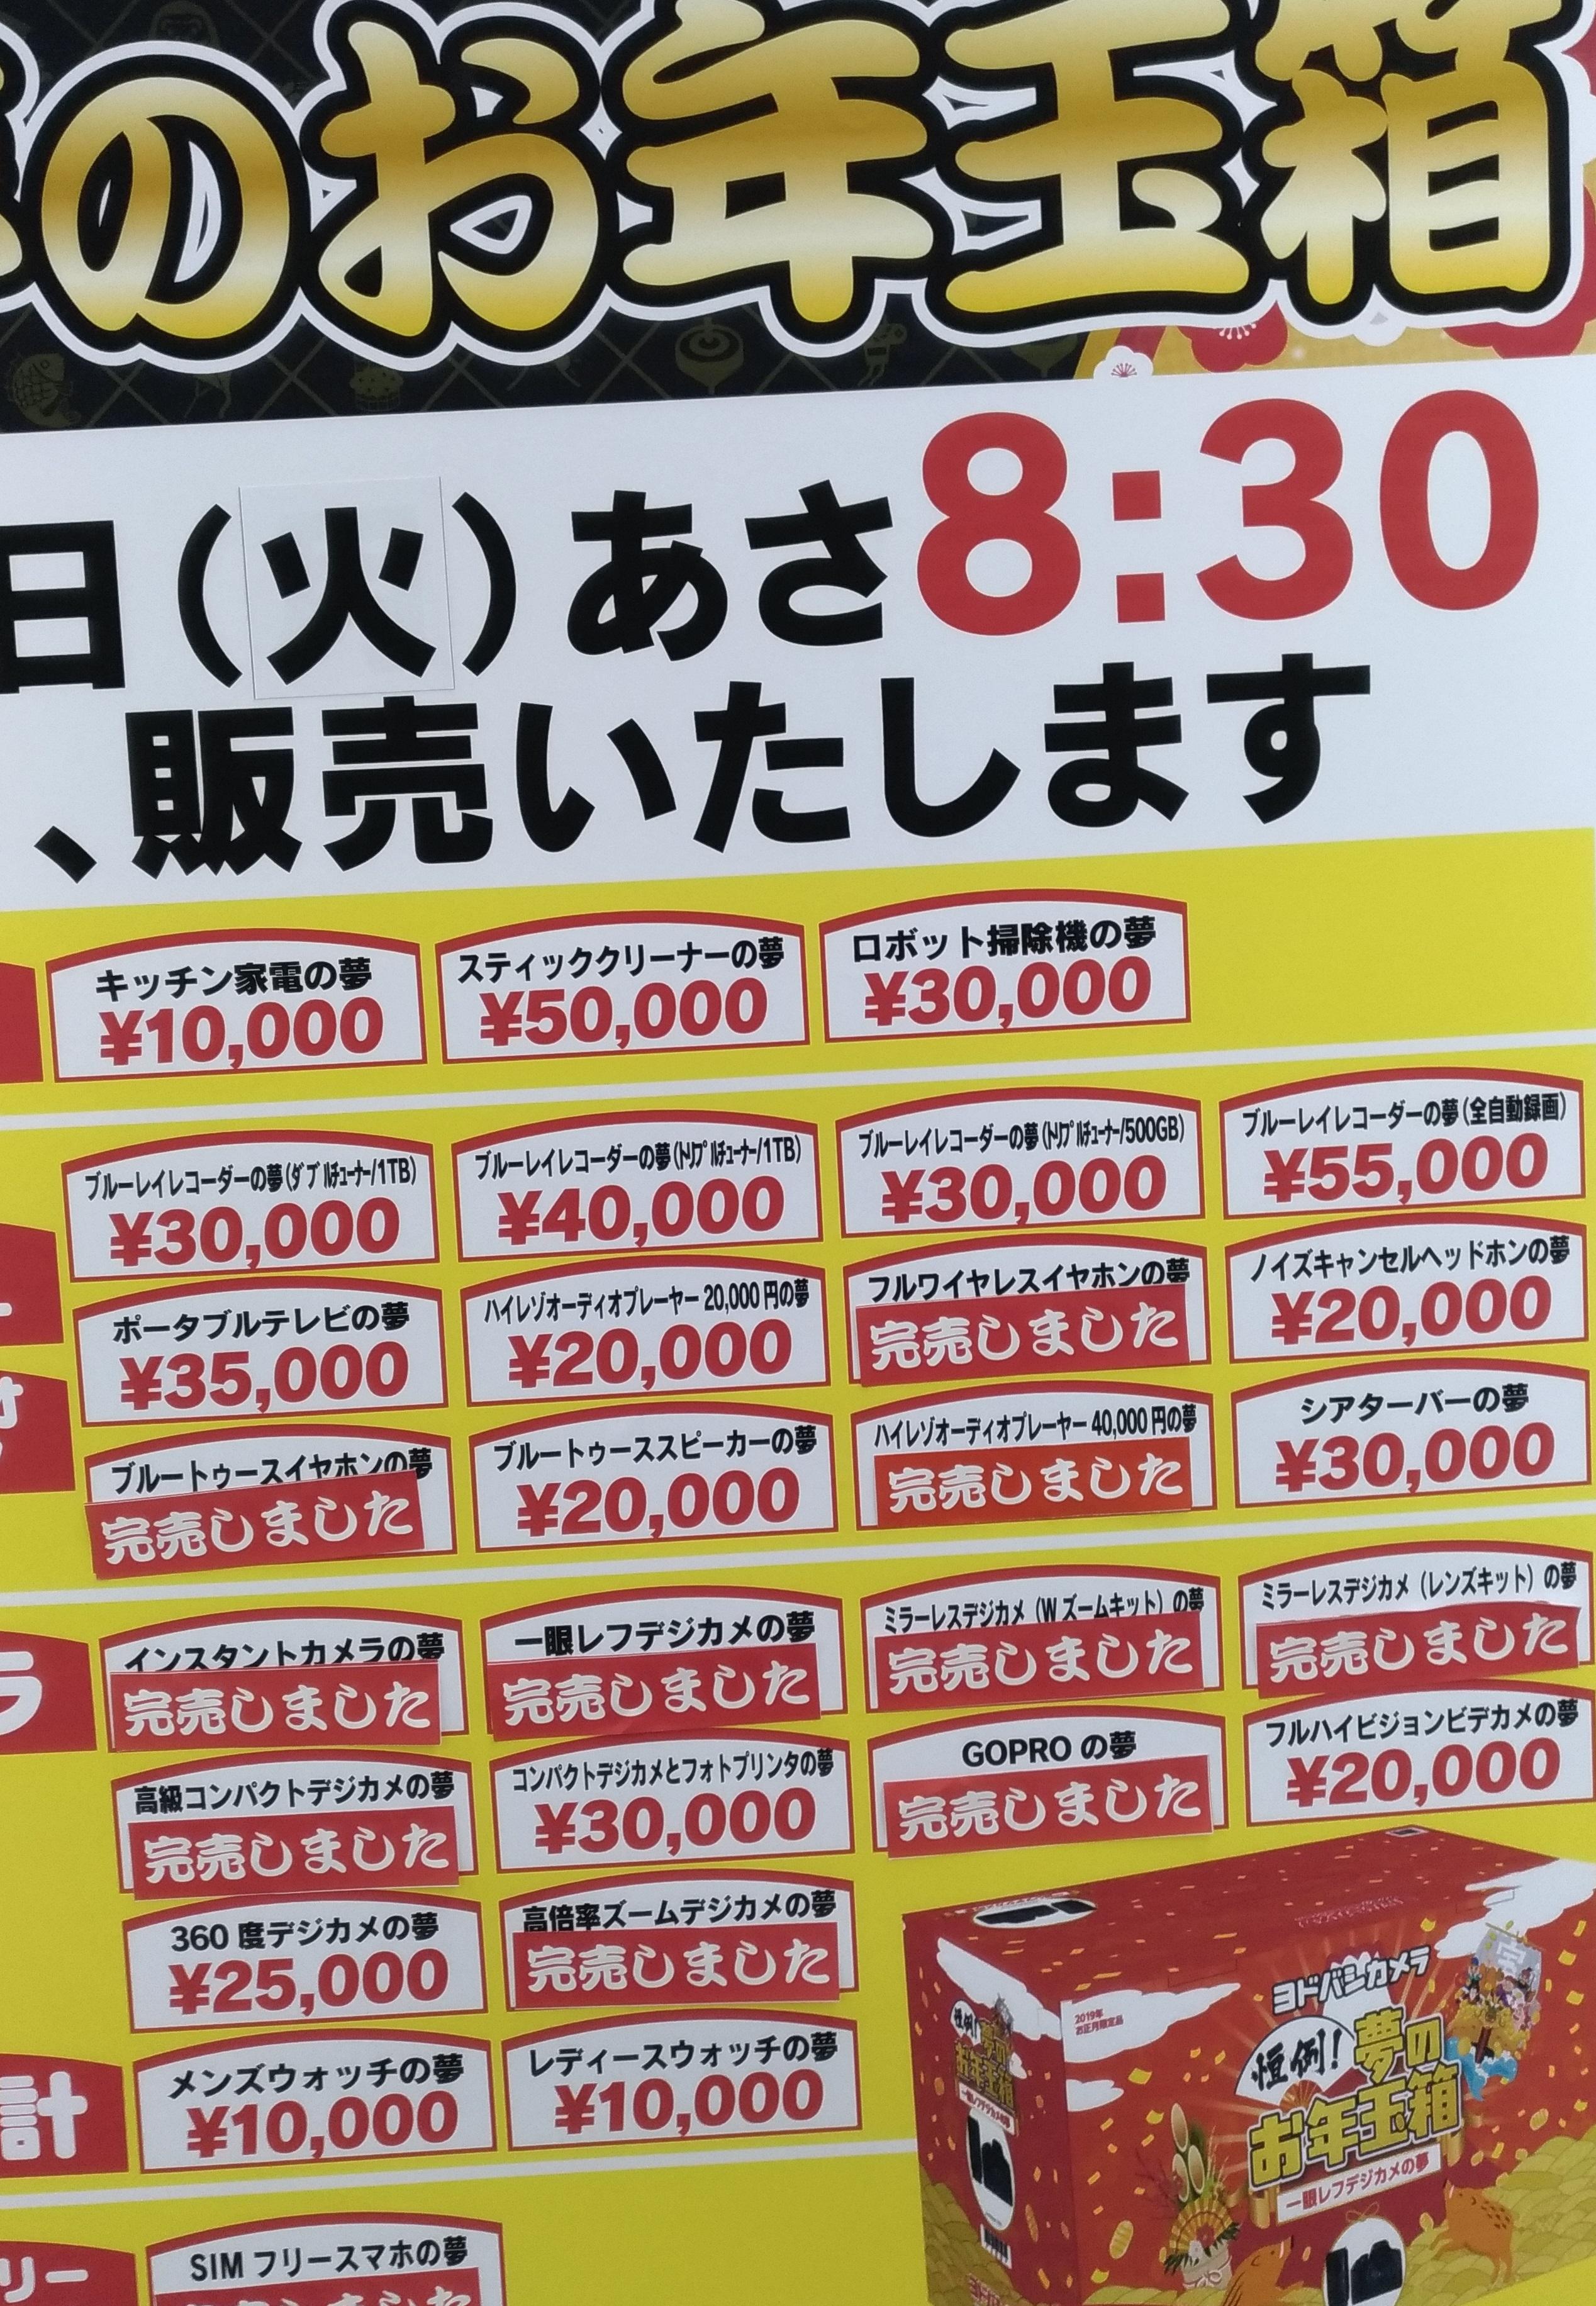 osaka_yodobashiumeda_fukubukuro_2019_.jpg